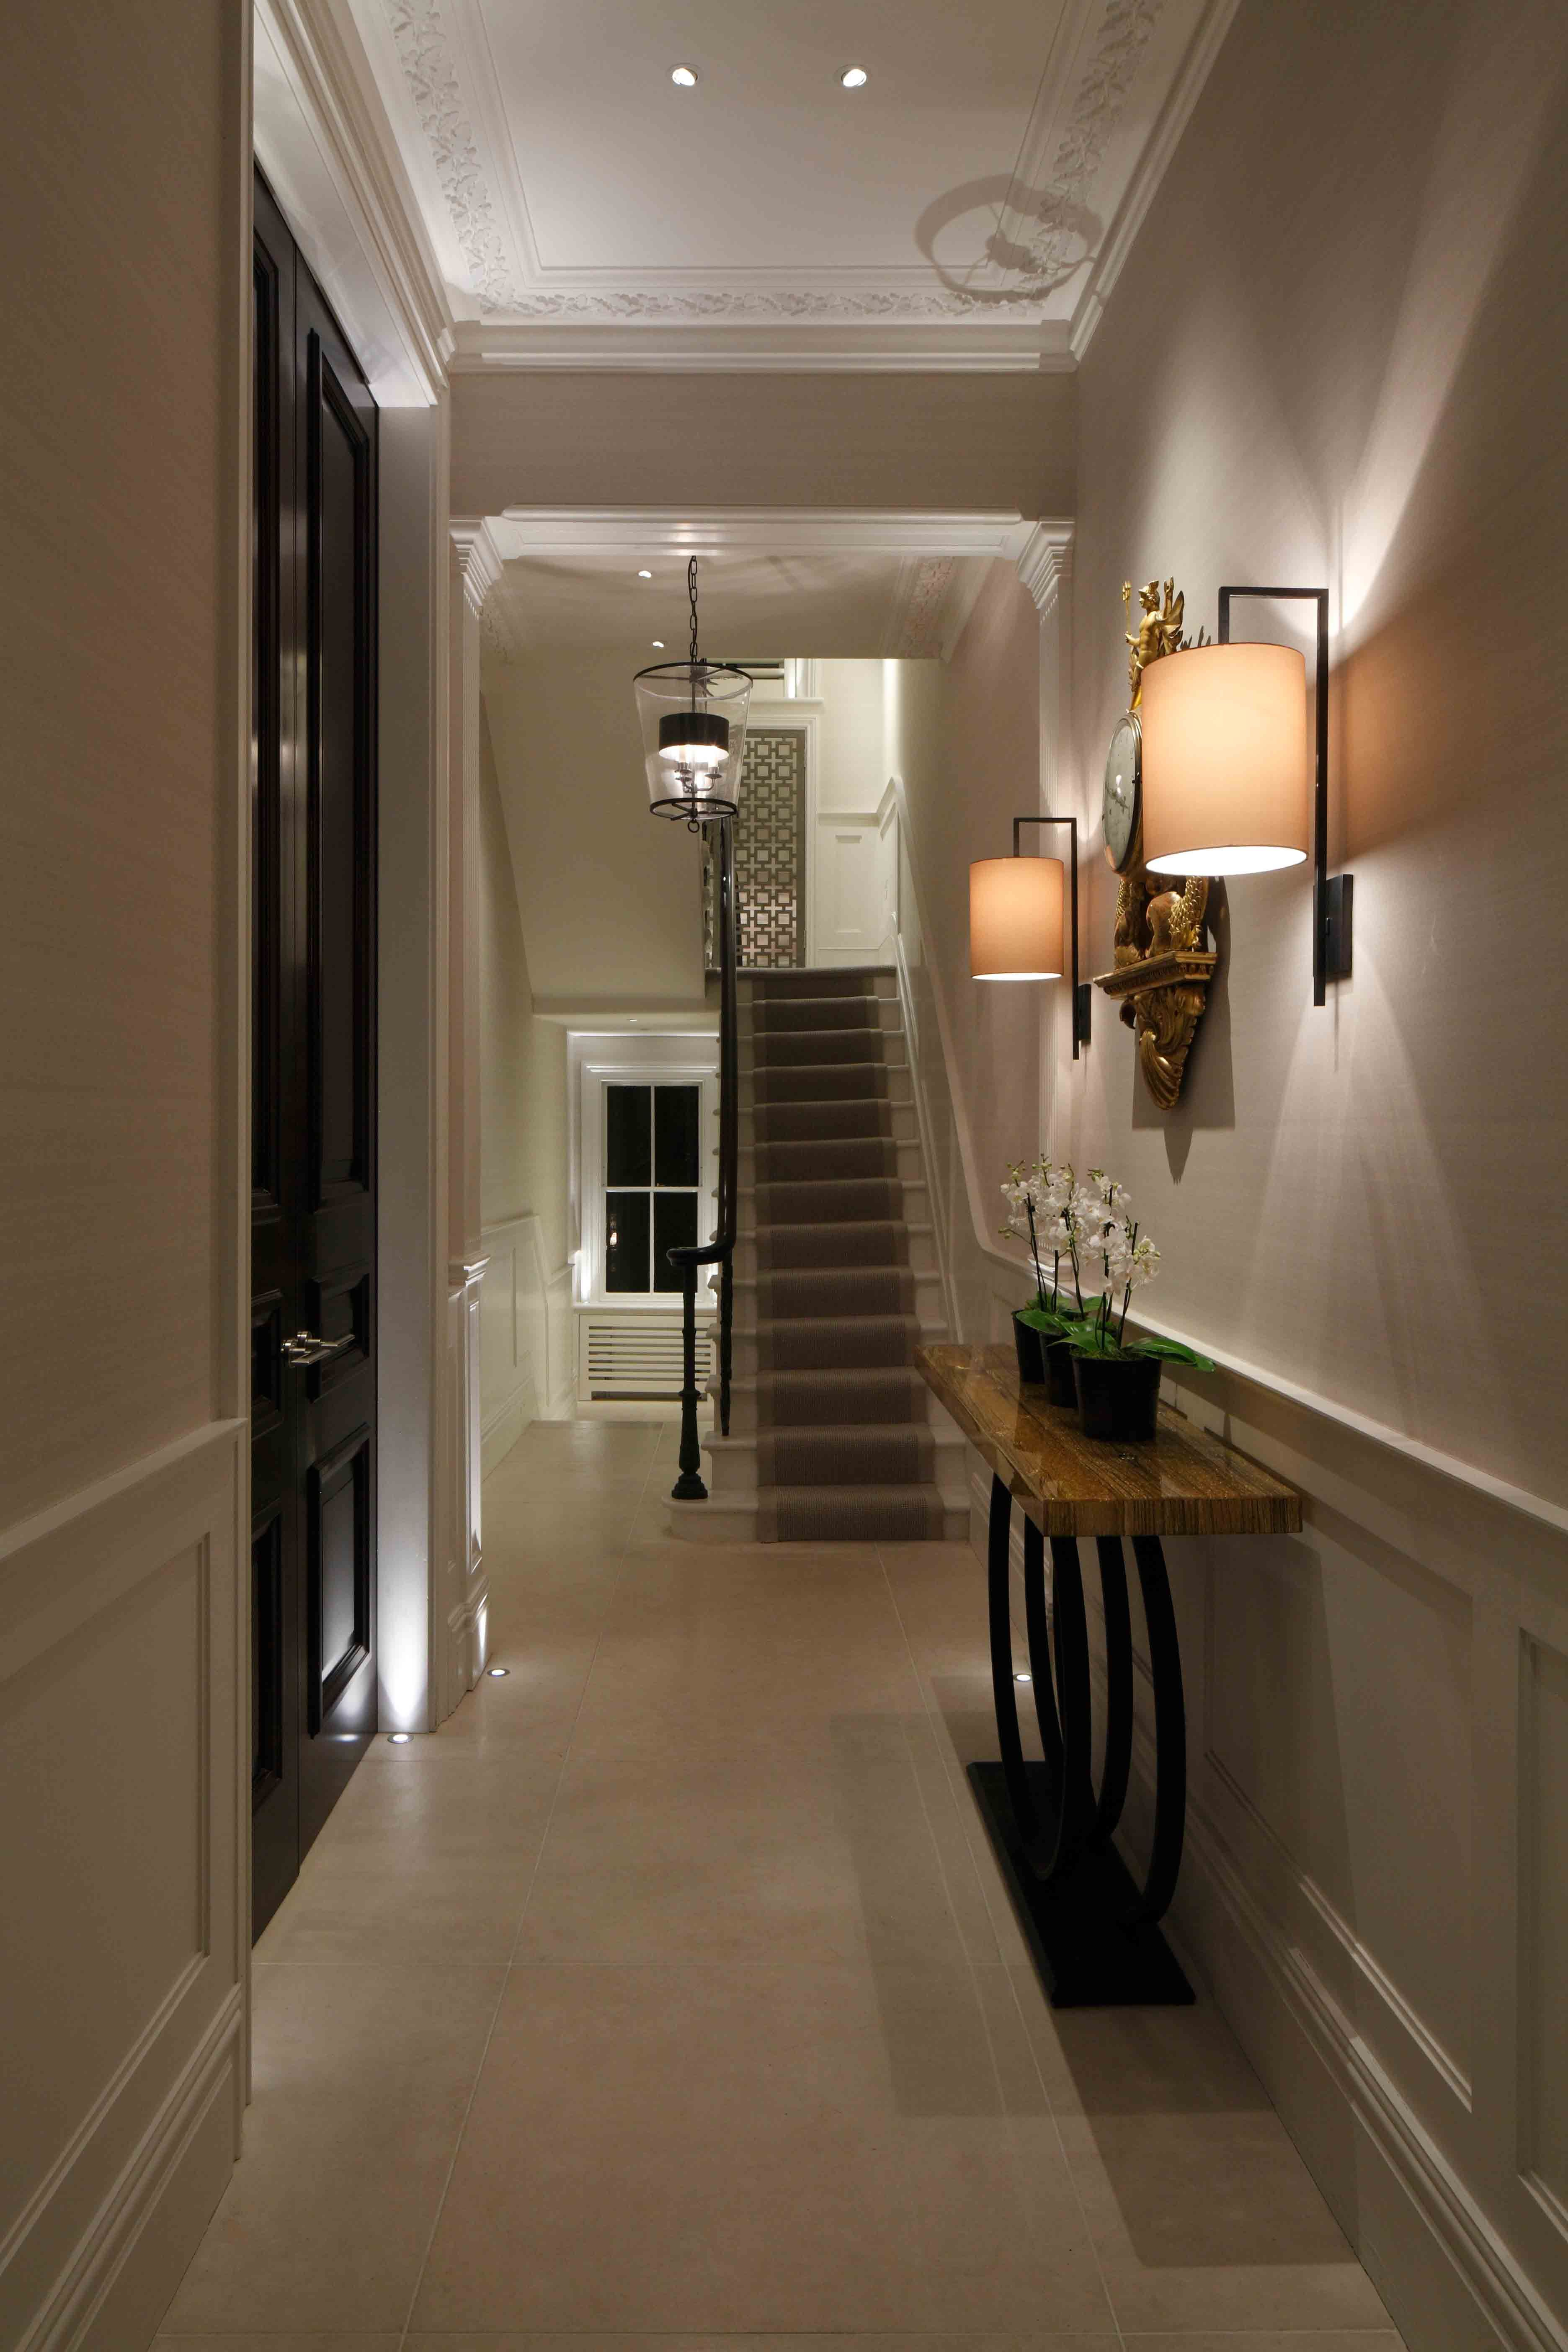 100 Project Ideas And Designs Hallway Lighting Hallway Wall